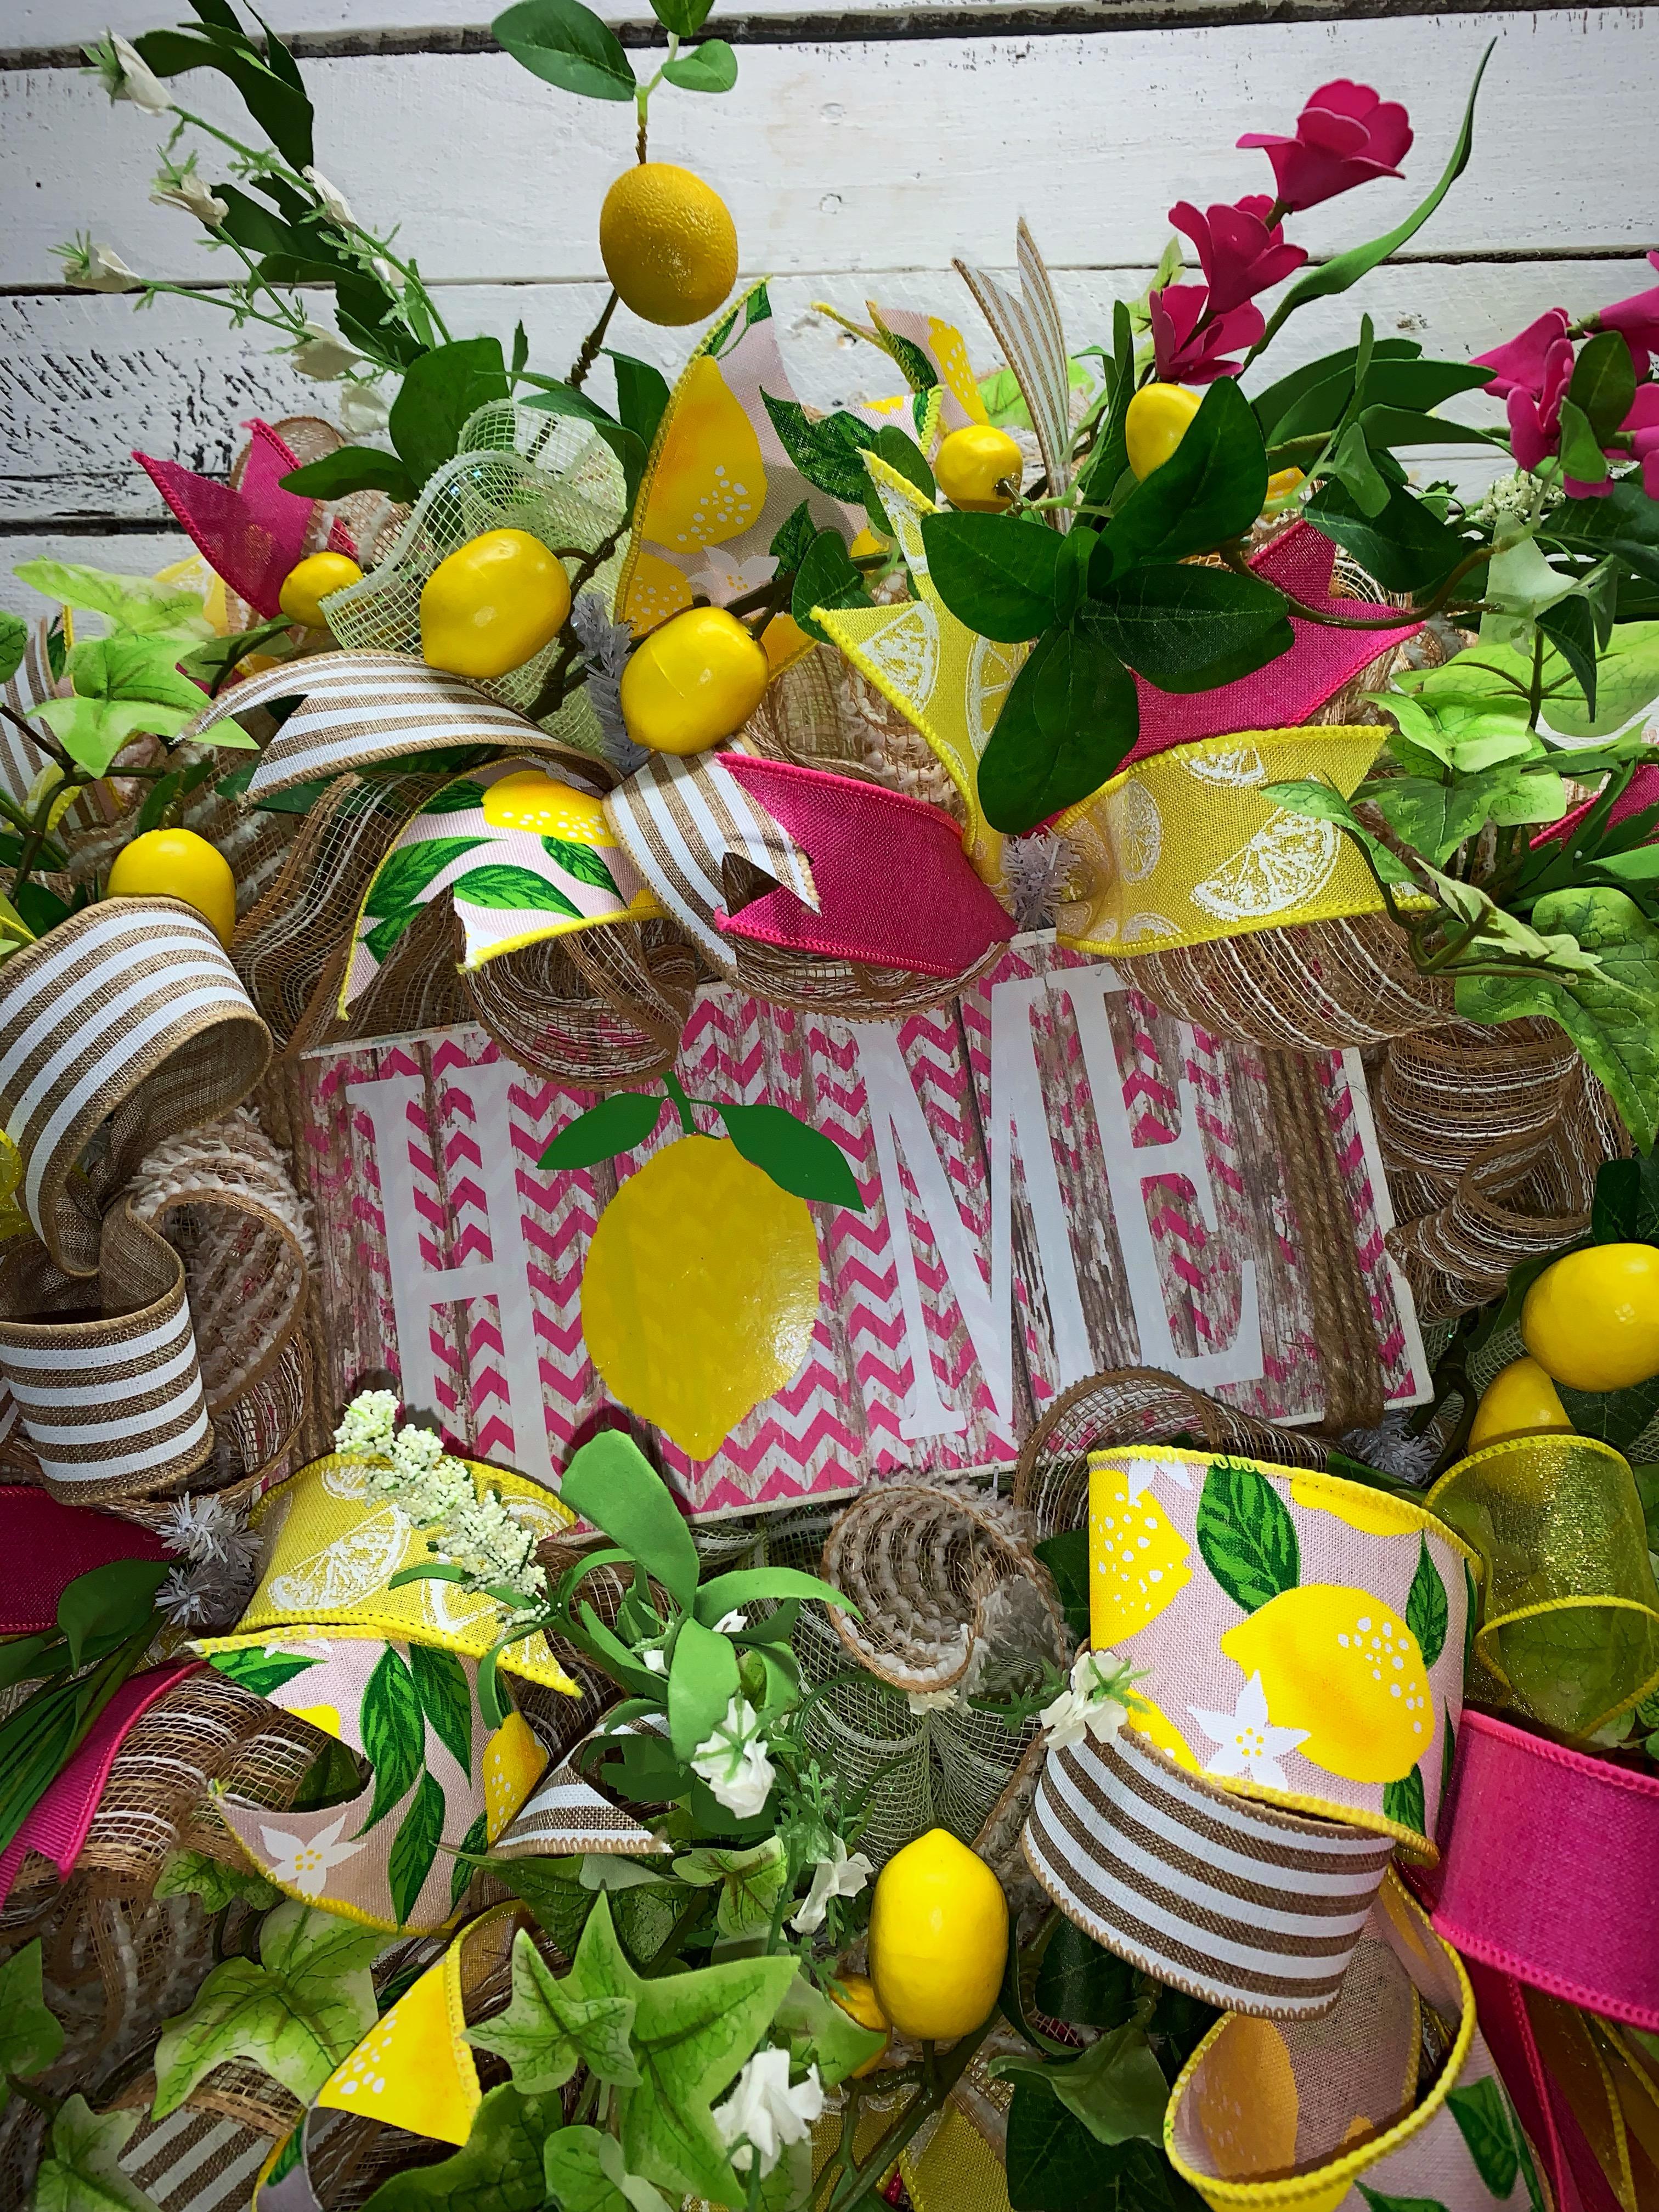 Summer Wreath Lemon Wreath Lemons Pink And Yellow Bright Colorful Summer Wreath Summer